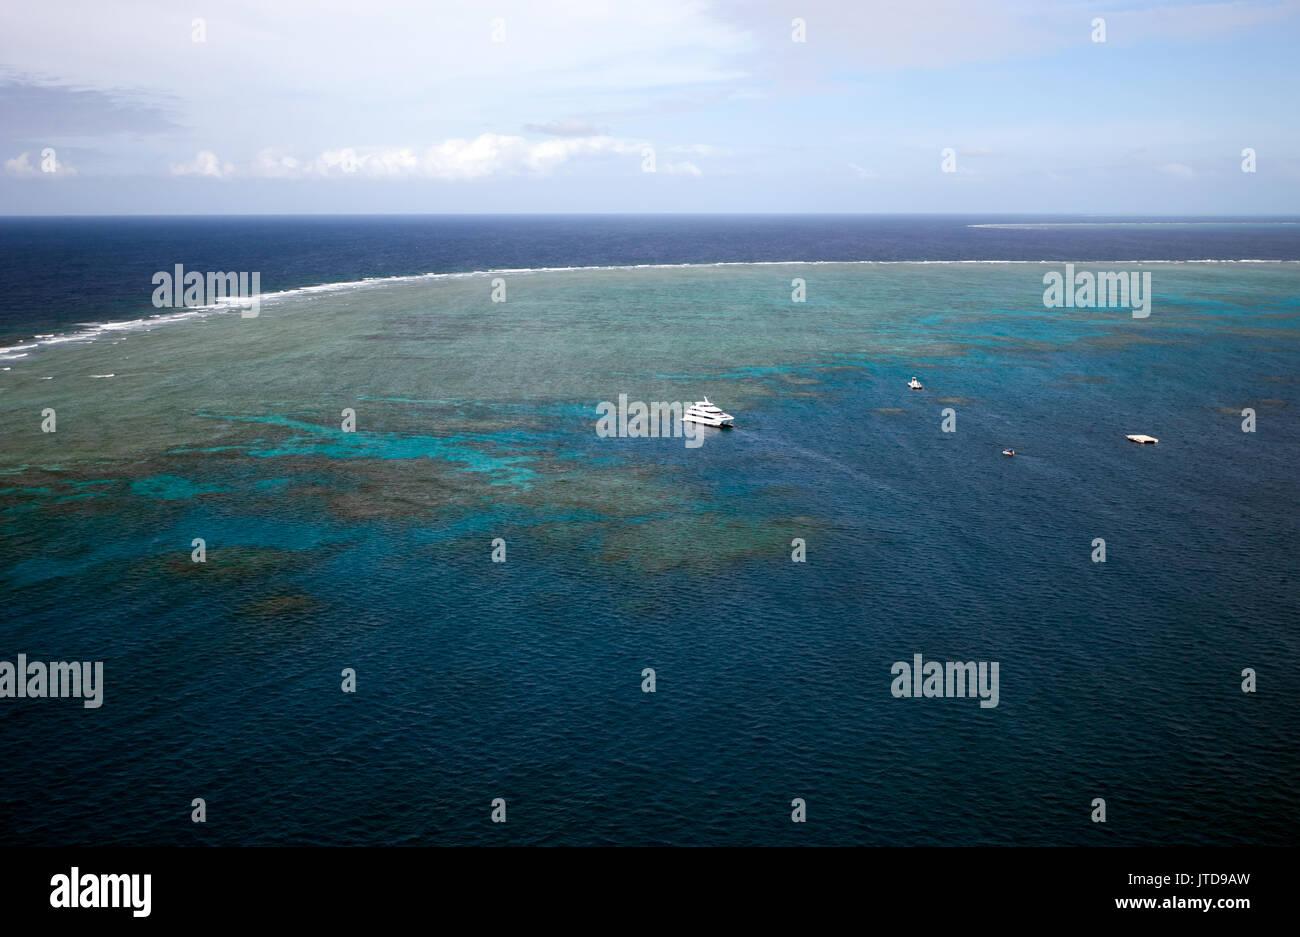 Aerial view of Hastings Reef, Cairns, Queensland, Australia - Stock Image